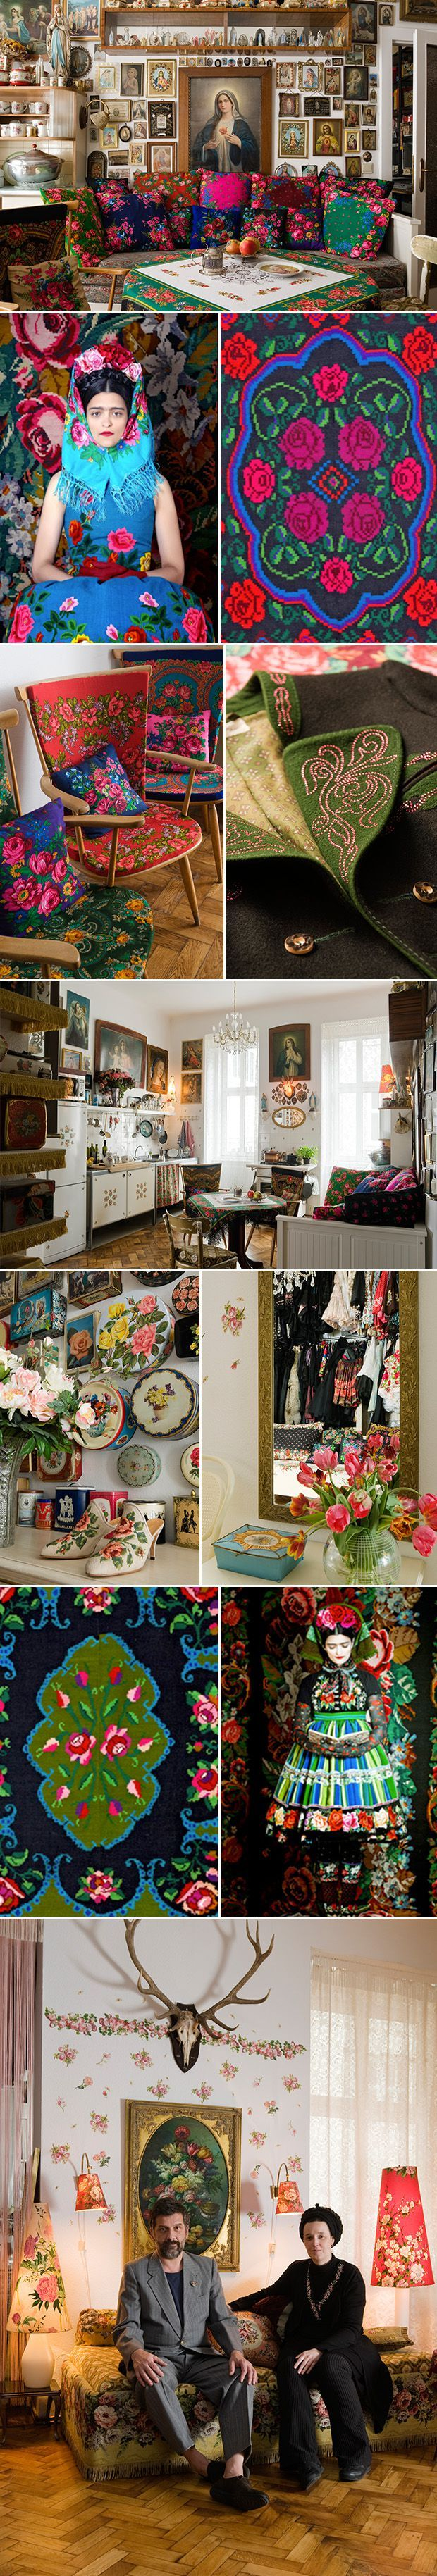 Déco à la moscovite magazine westwing | Westwing Home & Living Magazine